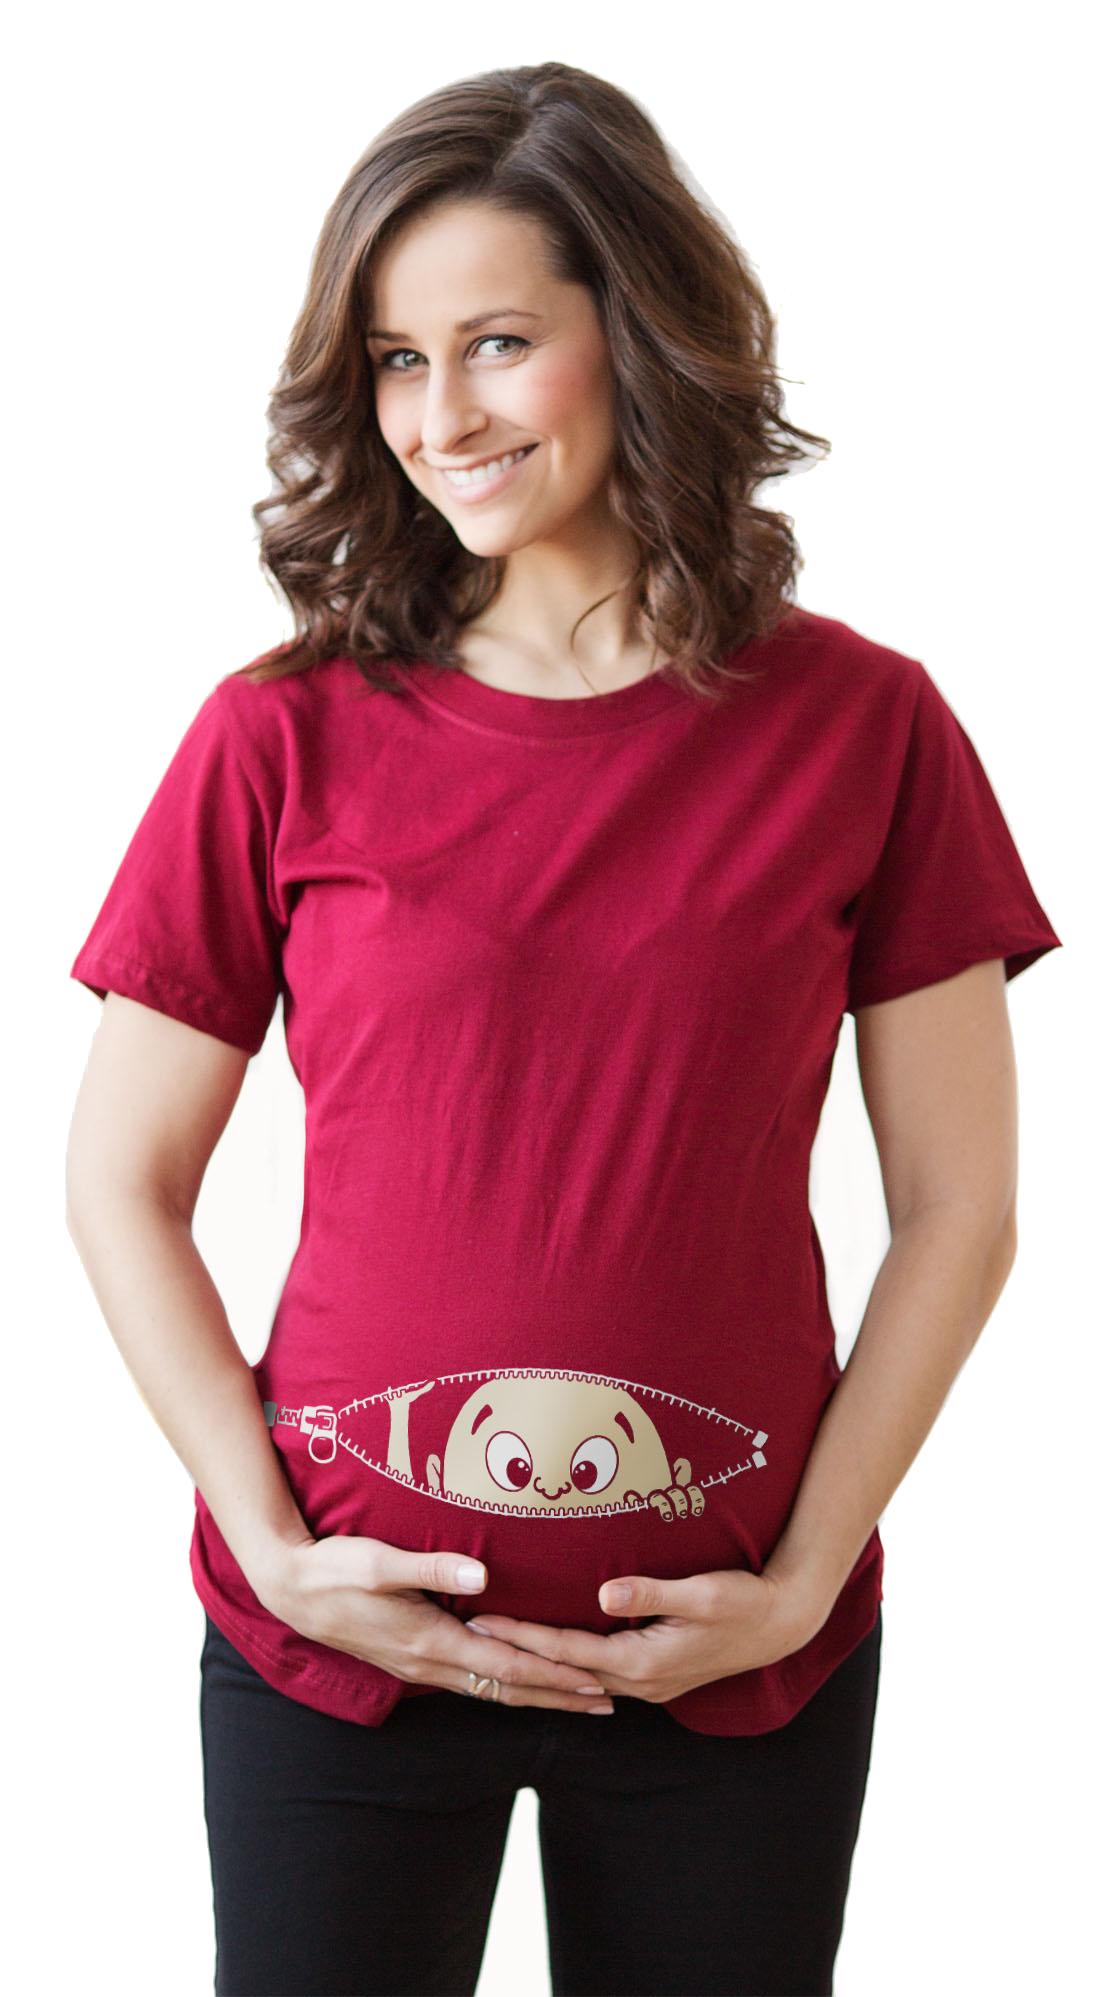 e33a038f652e3 Maternity Baby Peeking Shirt Funny Pregnancy Cute Announcement Pregnant T  shirts (Red) S